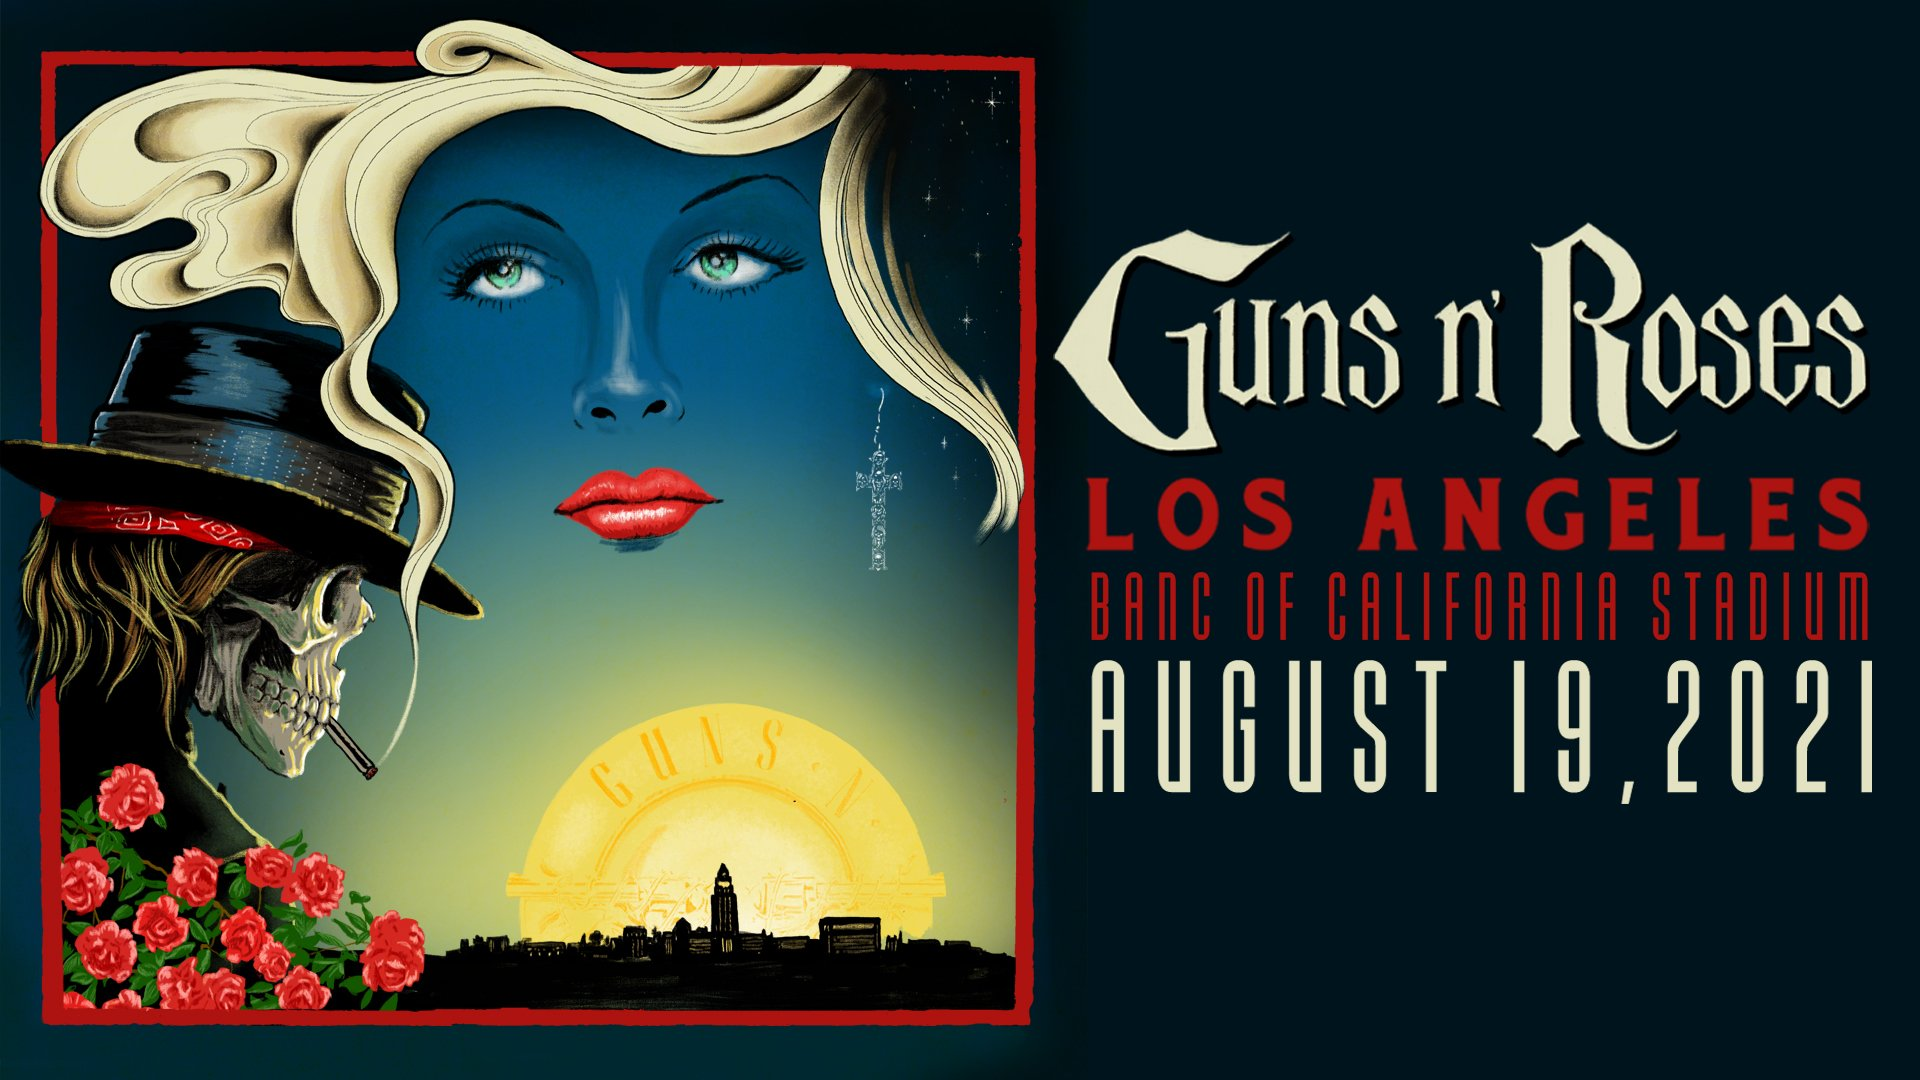 2021.08.19 - Banc Of California Stadium, Los Angeles, CA, USA E9kuhv10